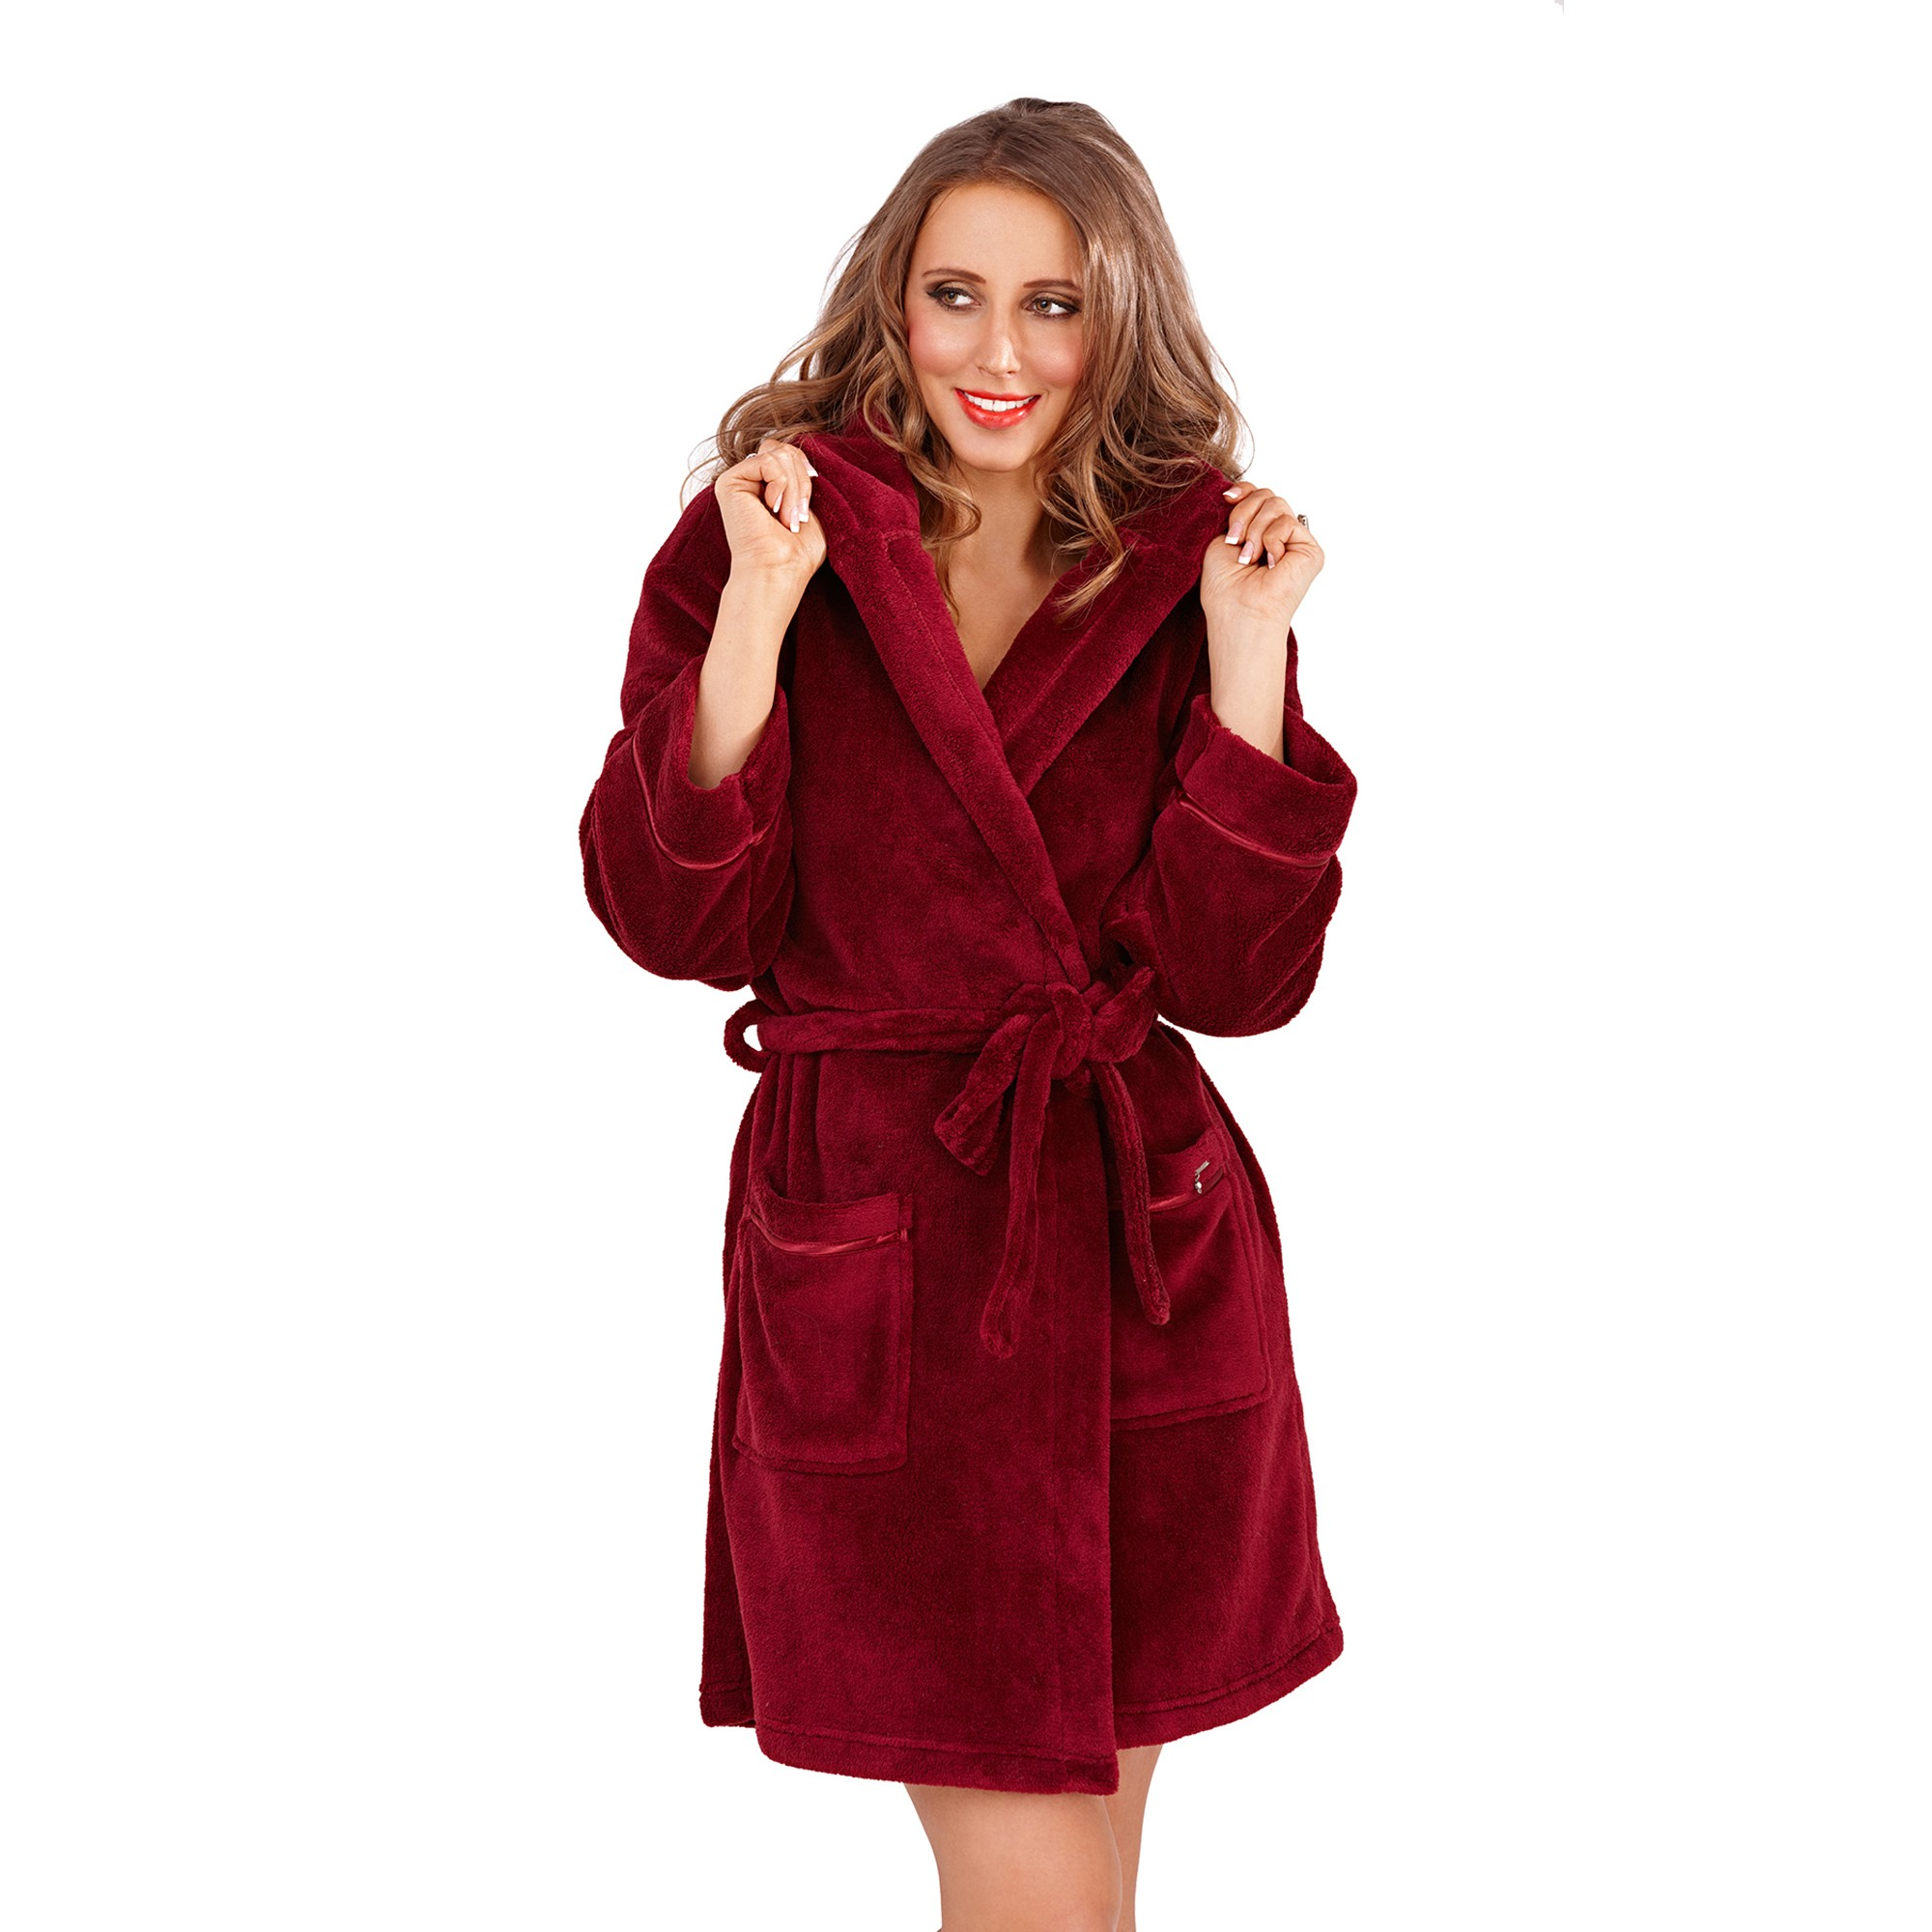 Ladies Super Soft Hooded Fleece Dressing Gown - Burgundy